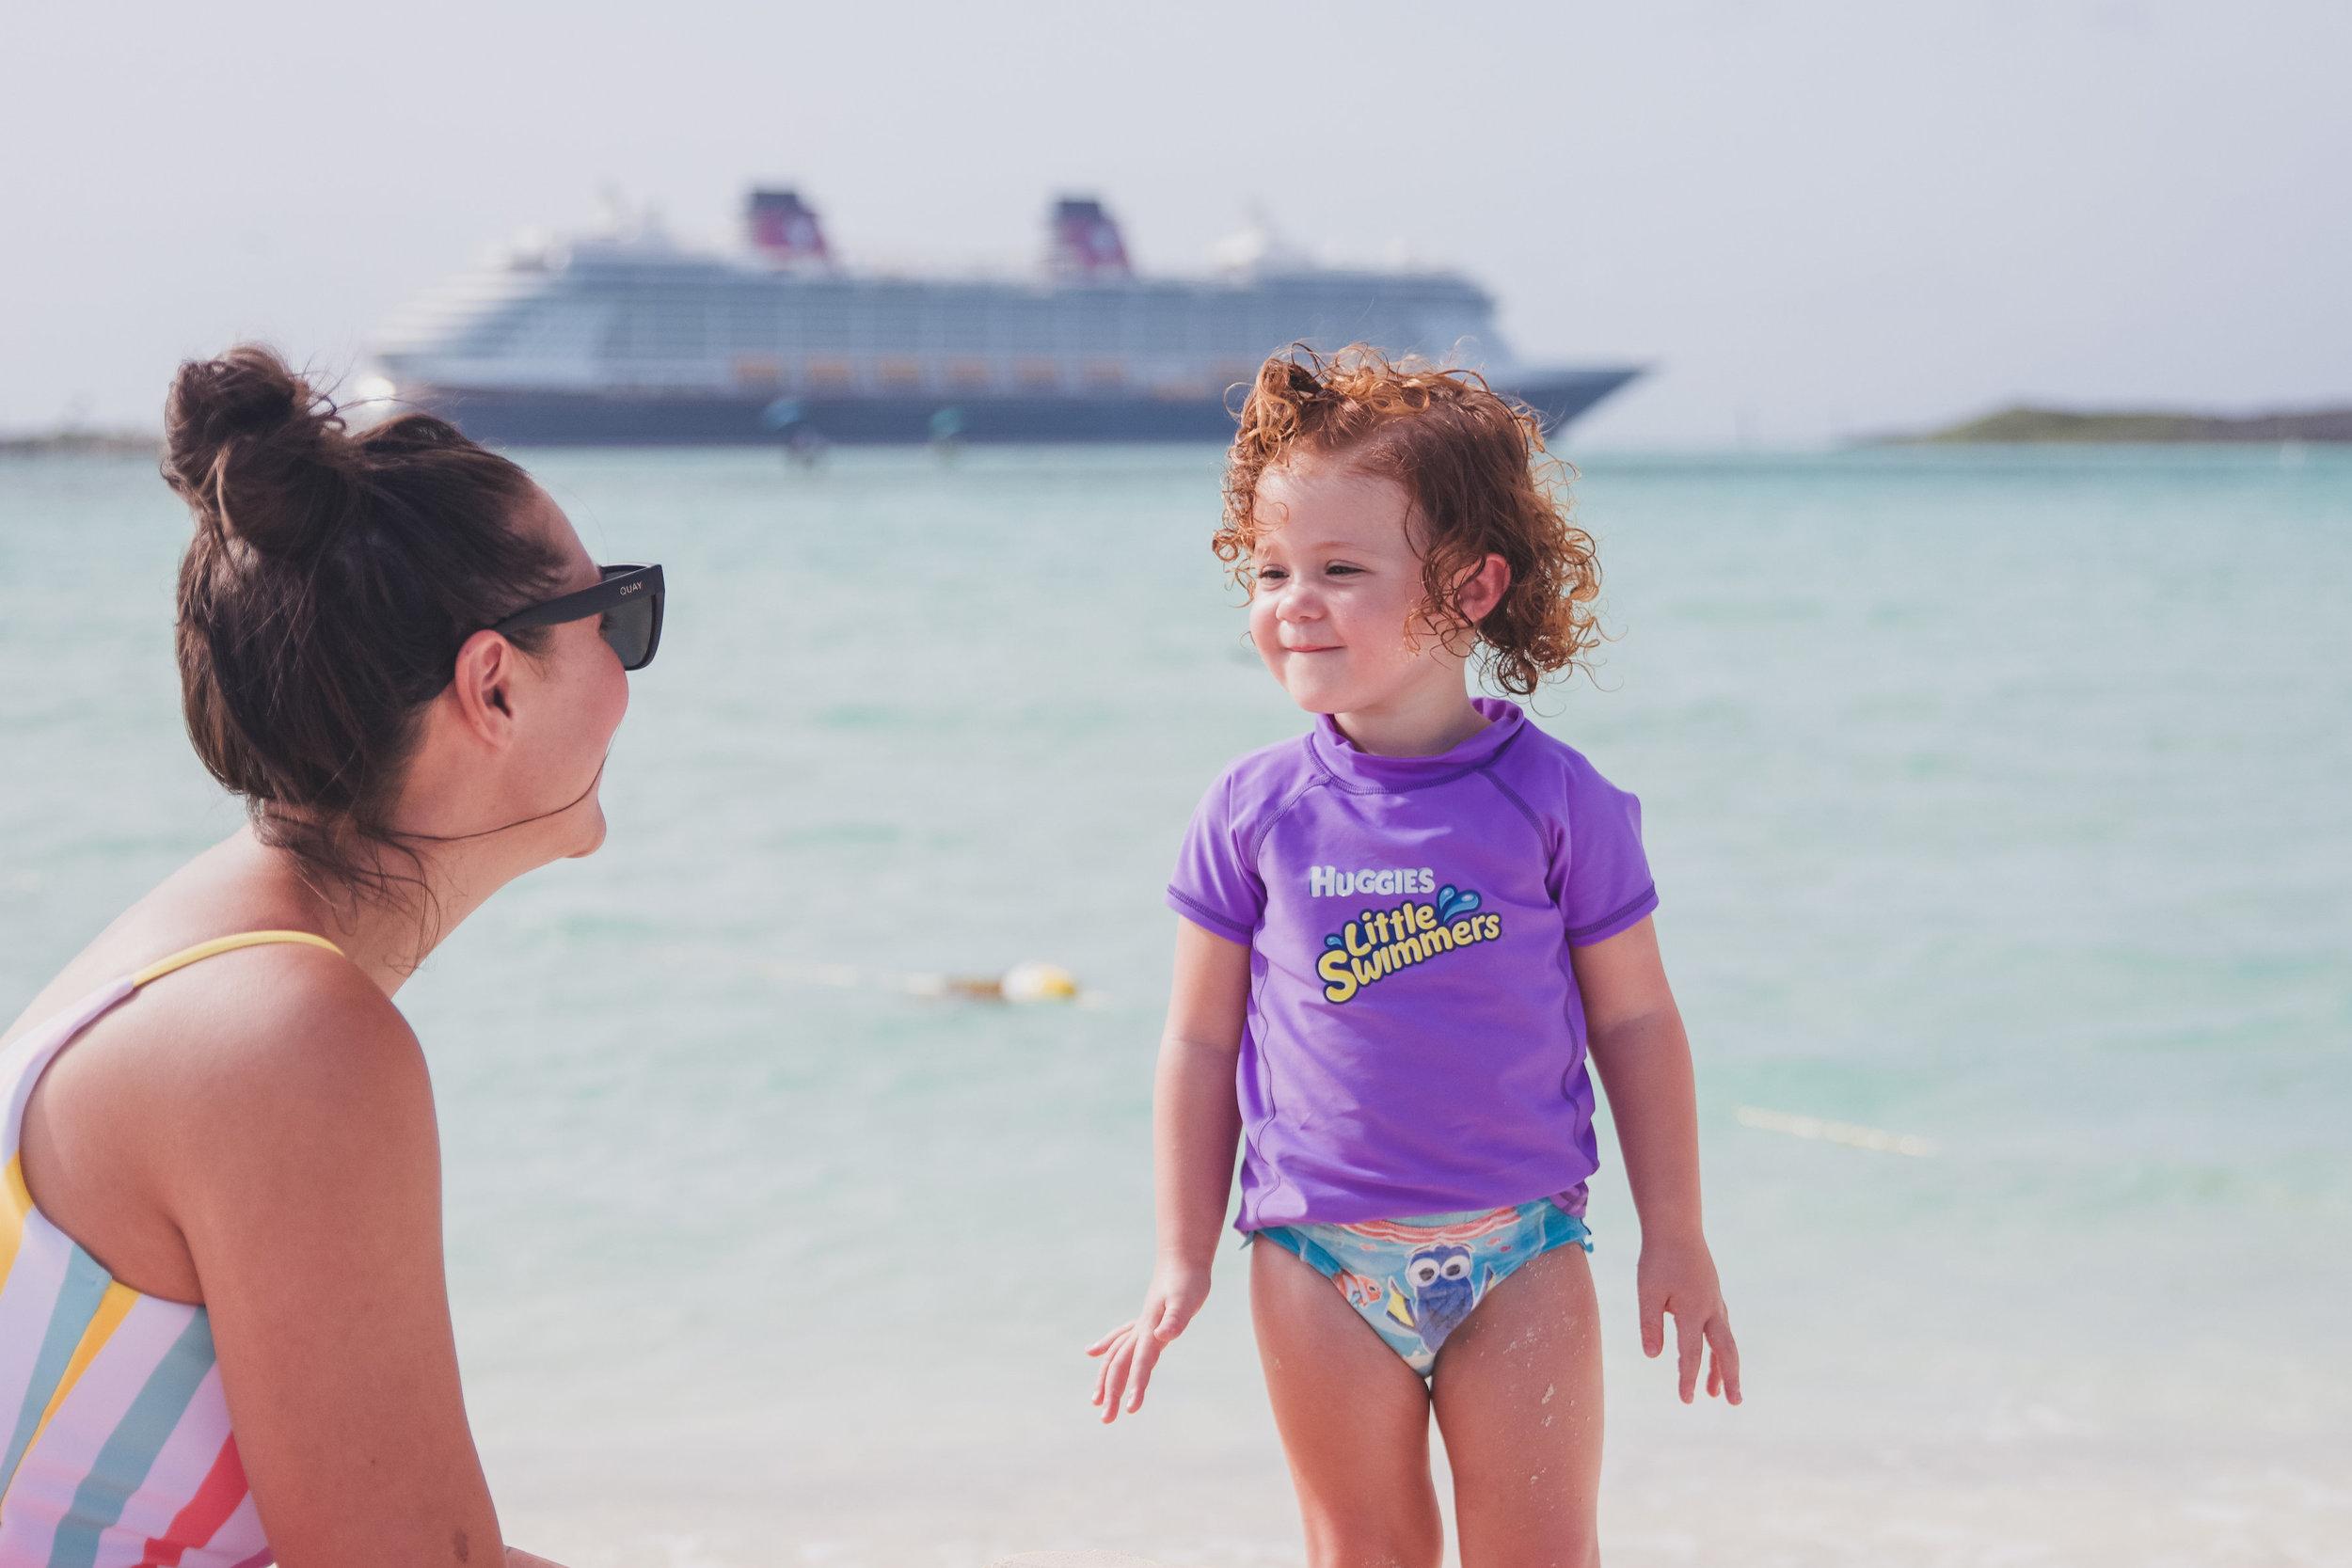 Huggies_Disney_Crusie_BabyBoyBakery-0602.jpg